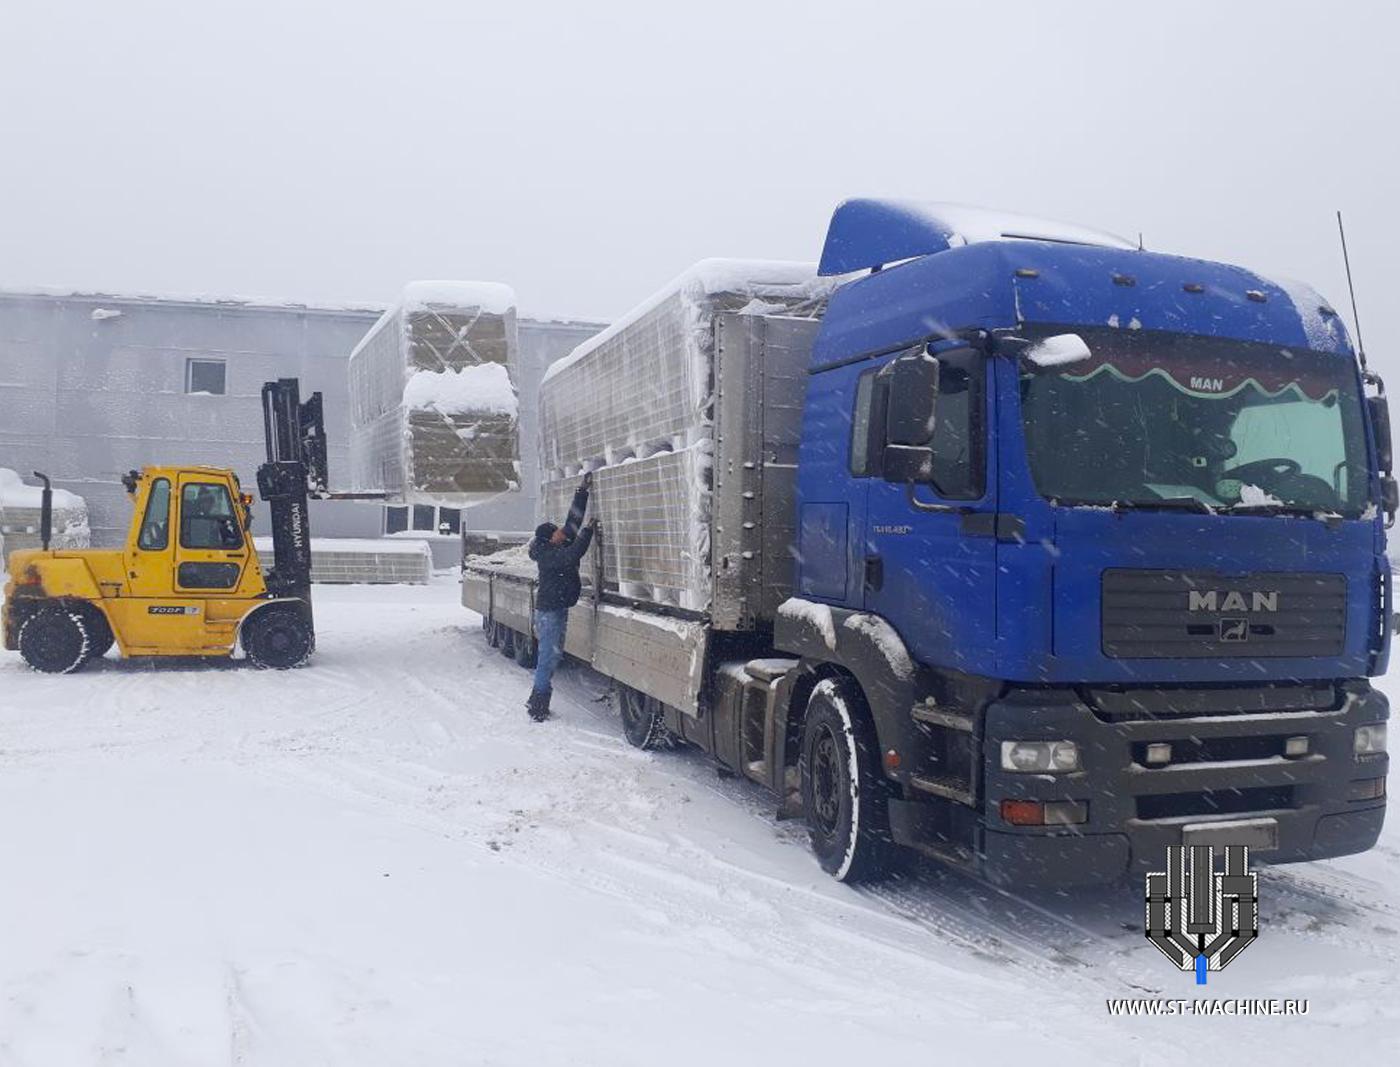 dostavka-konstrukzii-iz-metalla-proizvodstvo-metallokonstrukzii-st-machine.ru.jpg